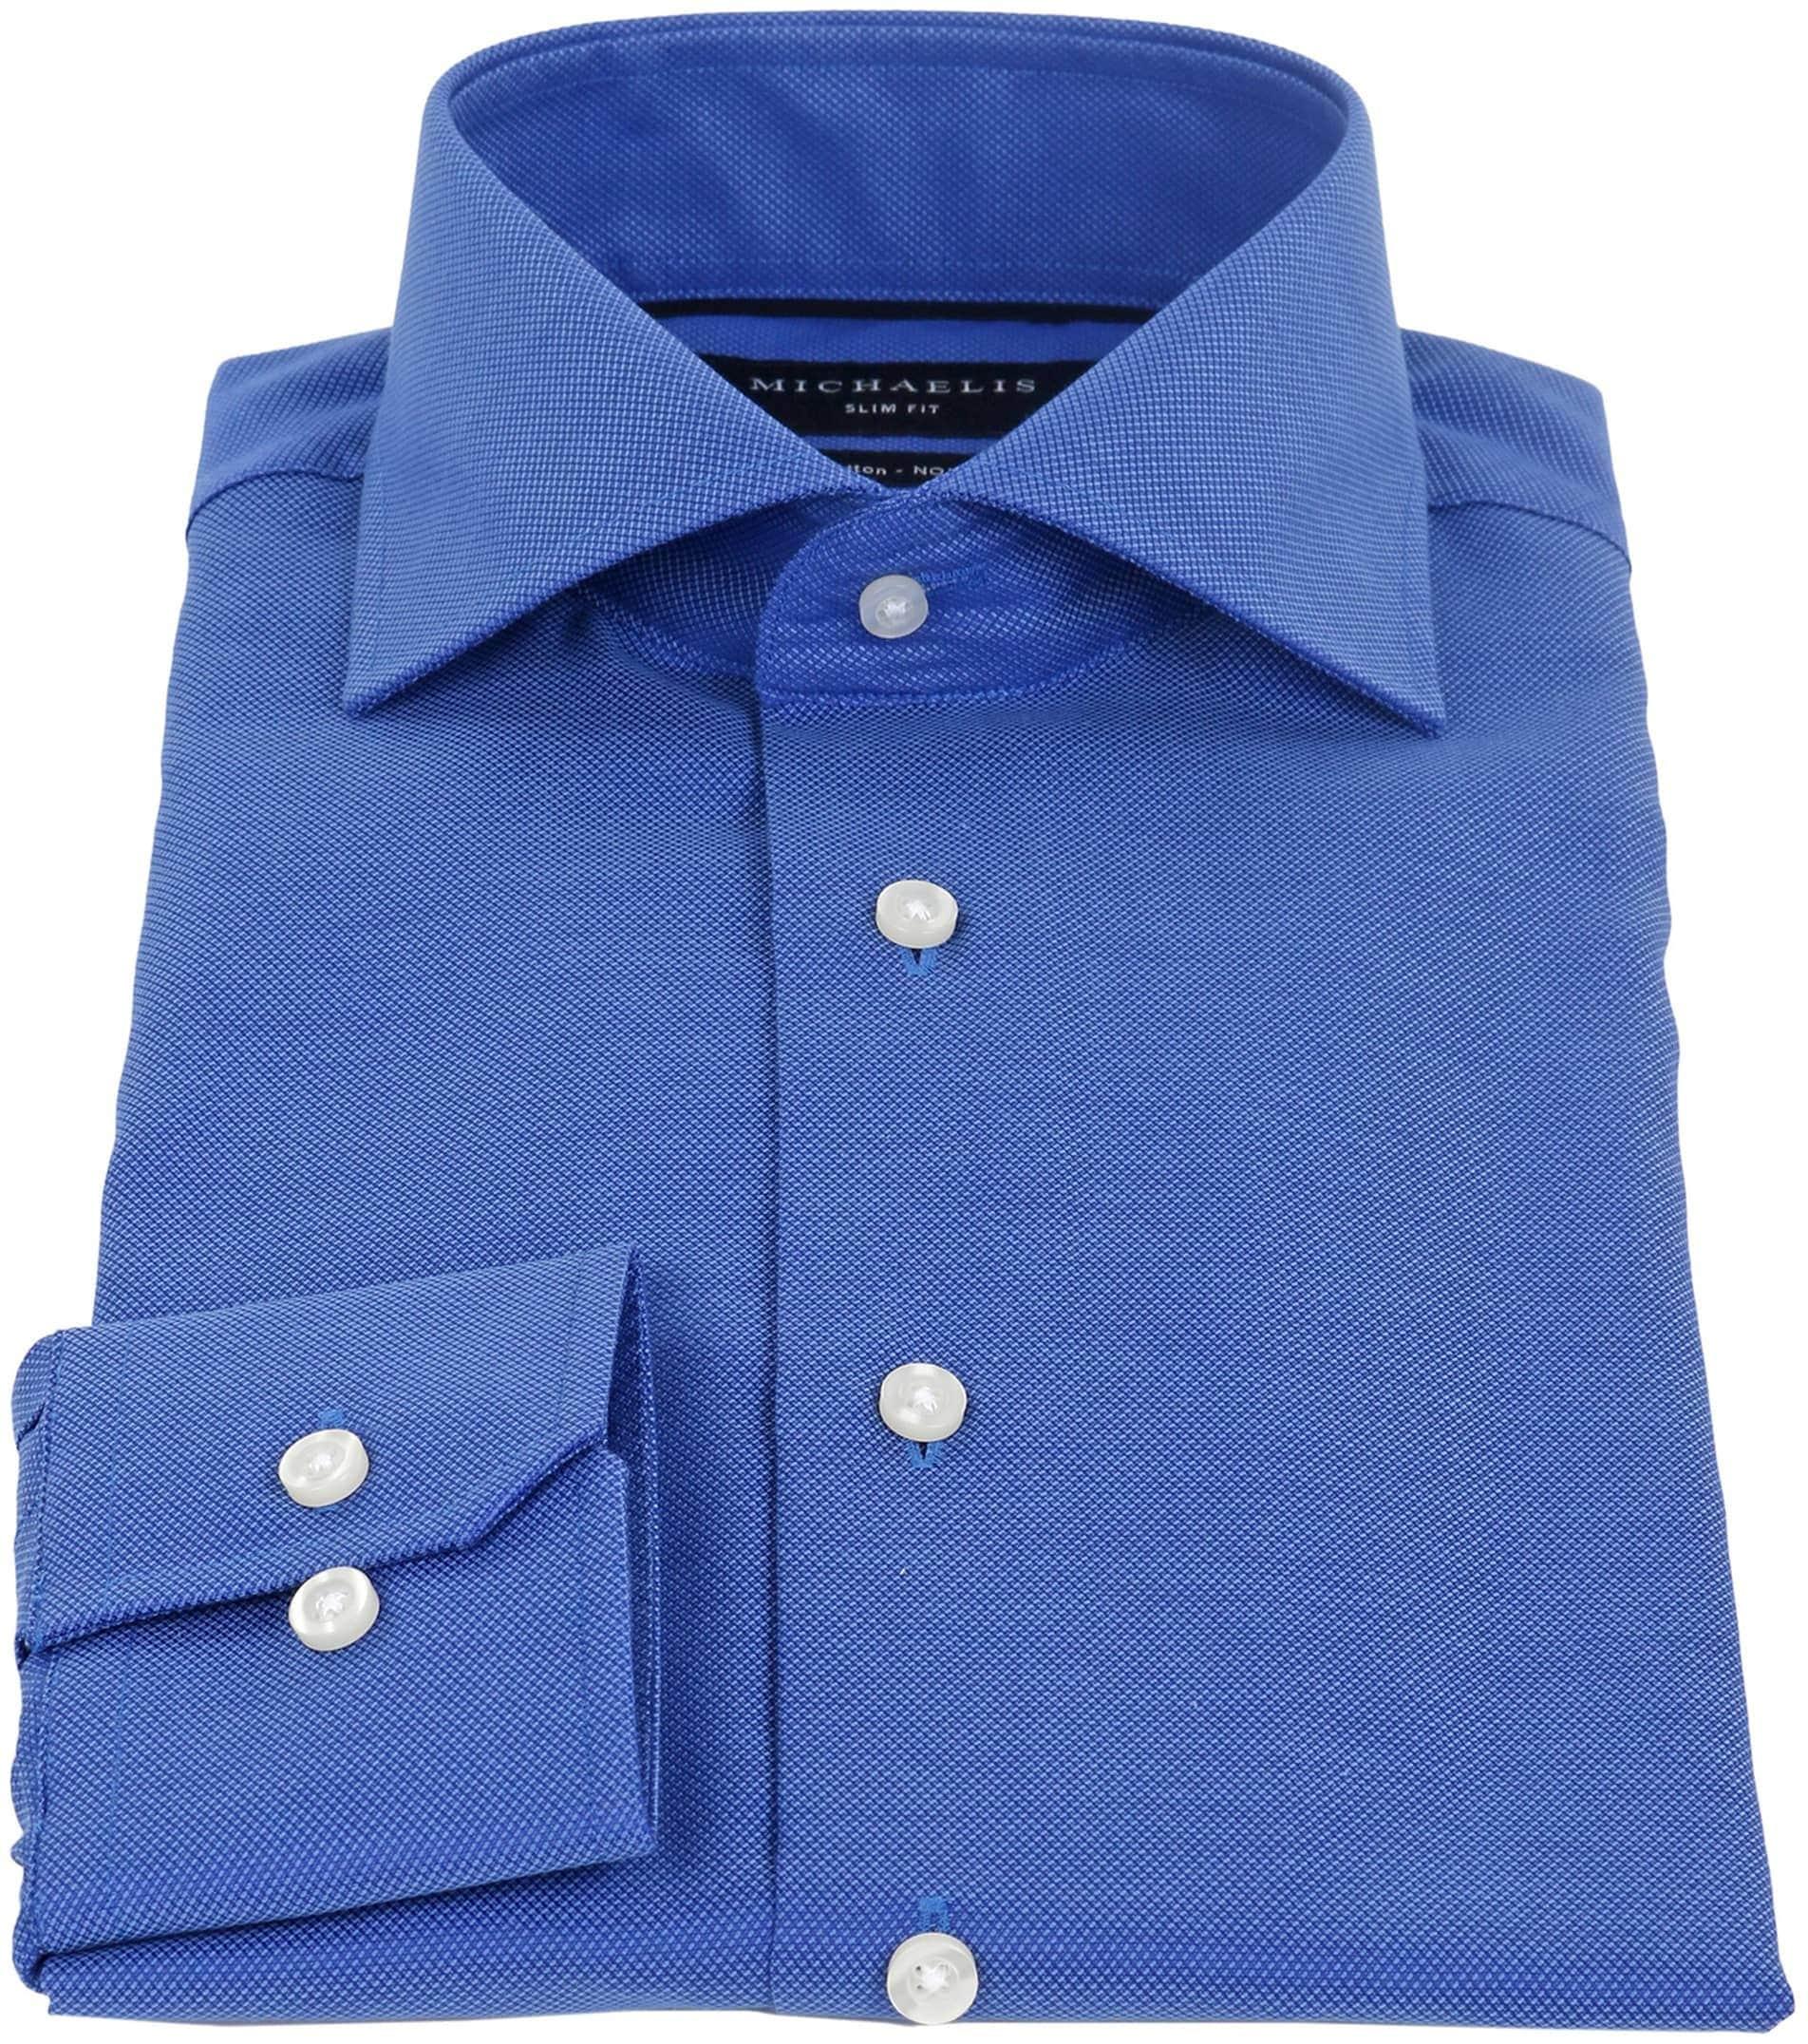 Michaelis Overhemd SlimFit Blauw foto 1